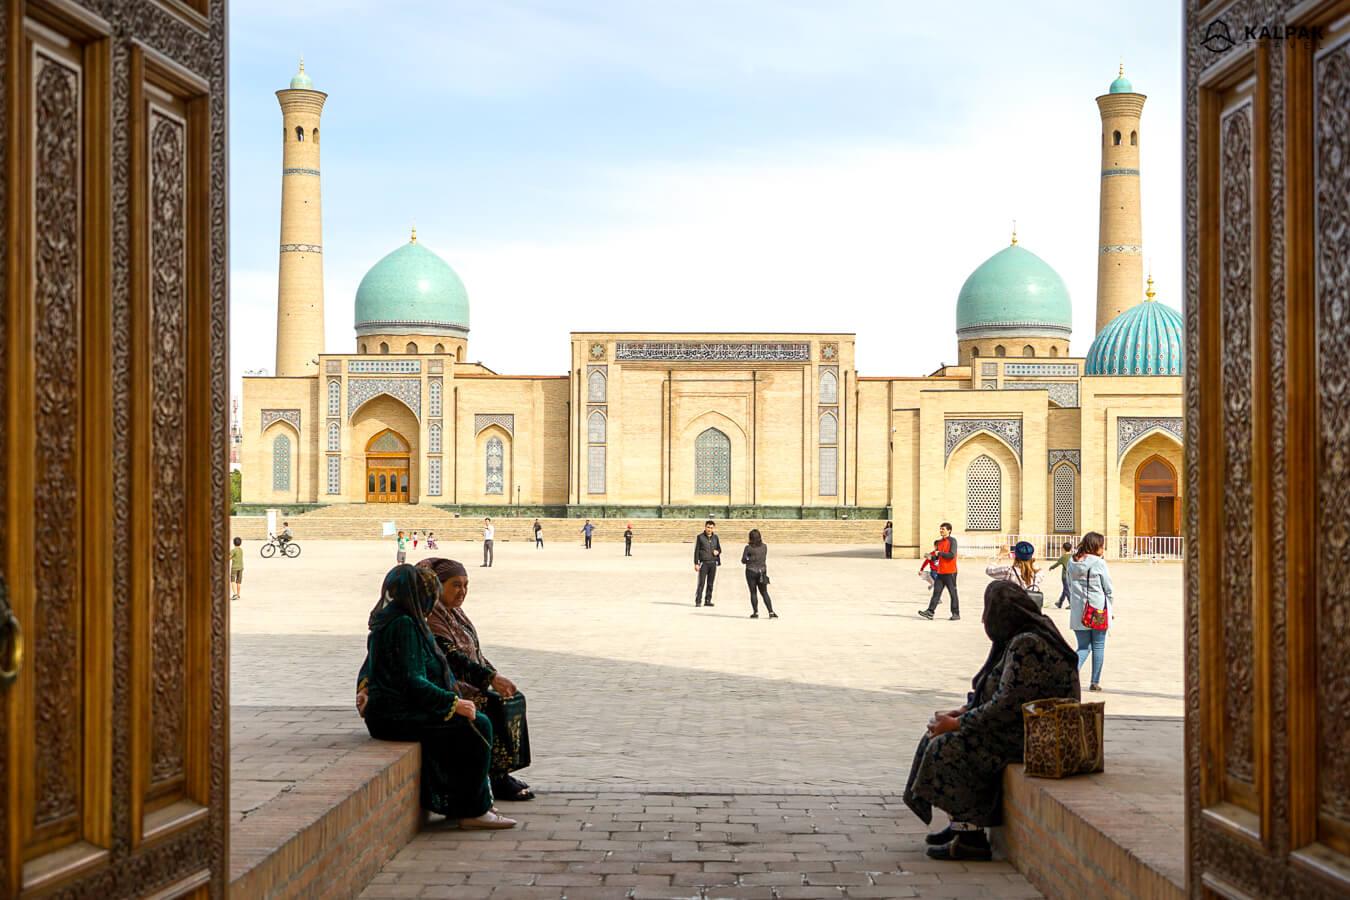 Khast imom complex in Tashkent